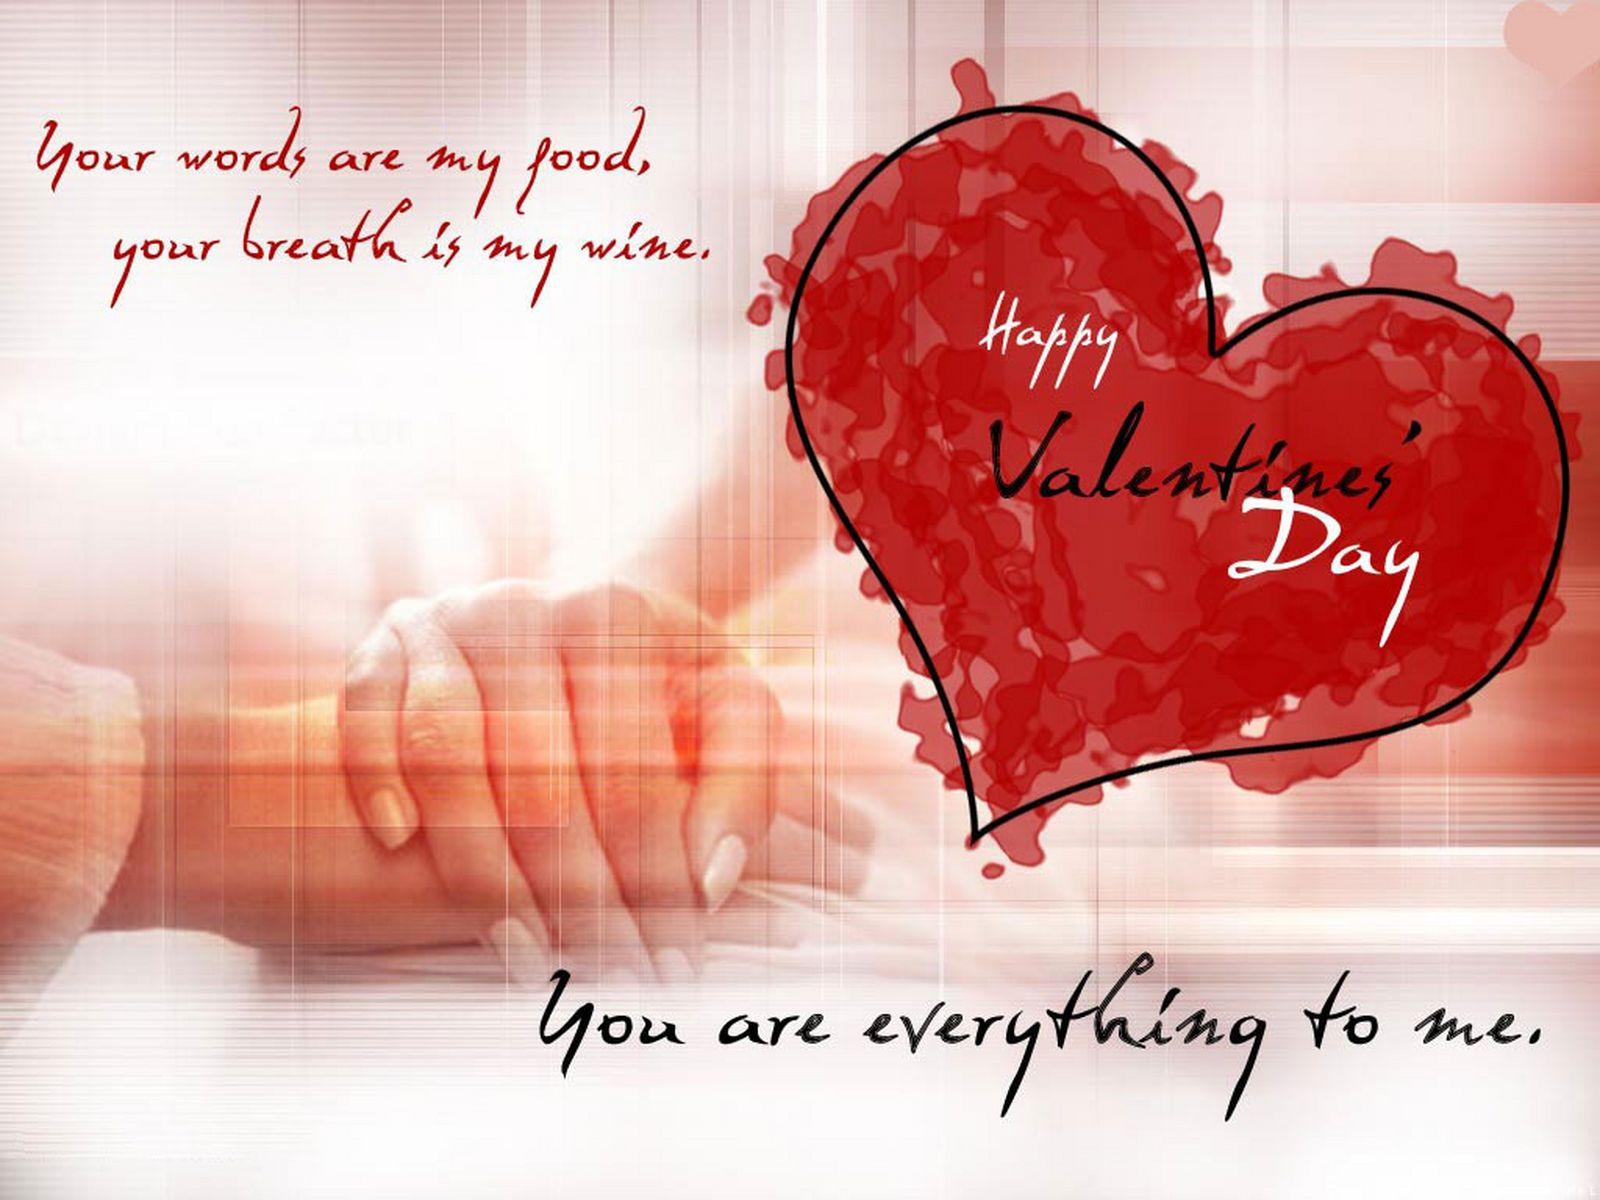 http://1.bp.blogspot.com/-ml0KGPmiKG4/UHxTe6-PxXI/AAAAAAAABo0/Ki8G7zadaeI/s1600/Sad-love-quotes-wallpapers+(7).JPG